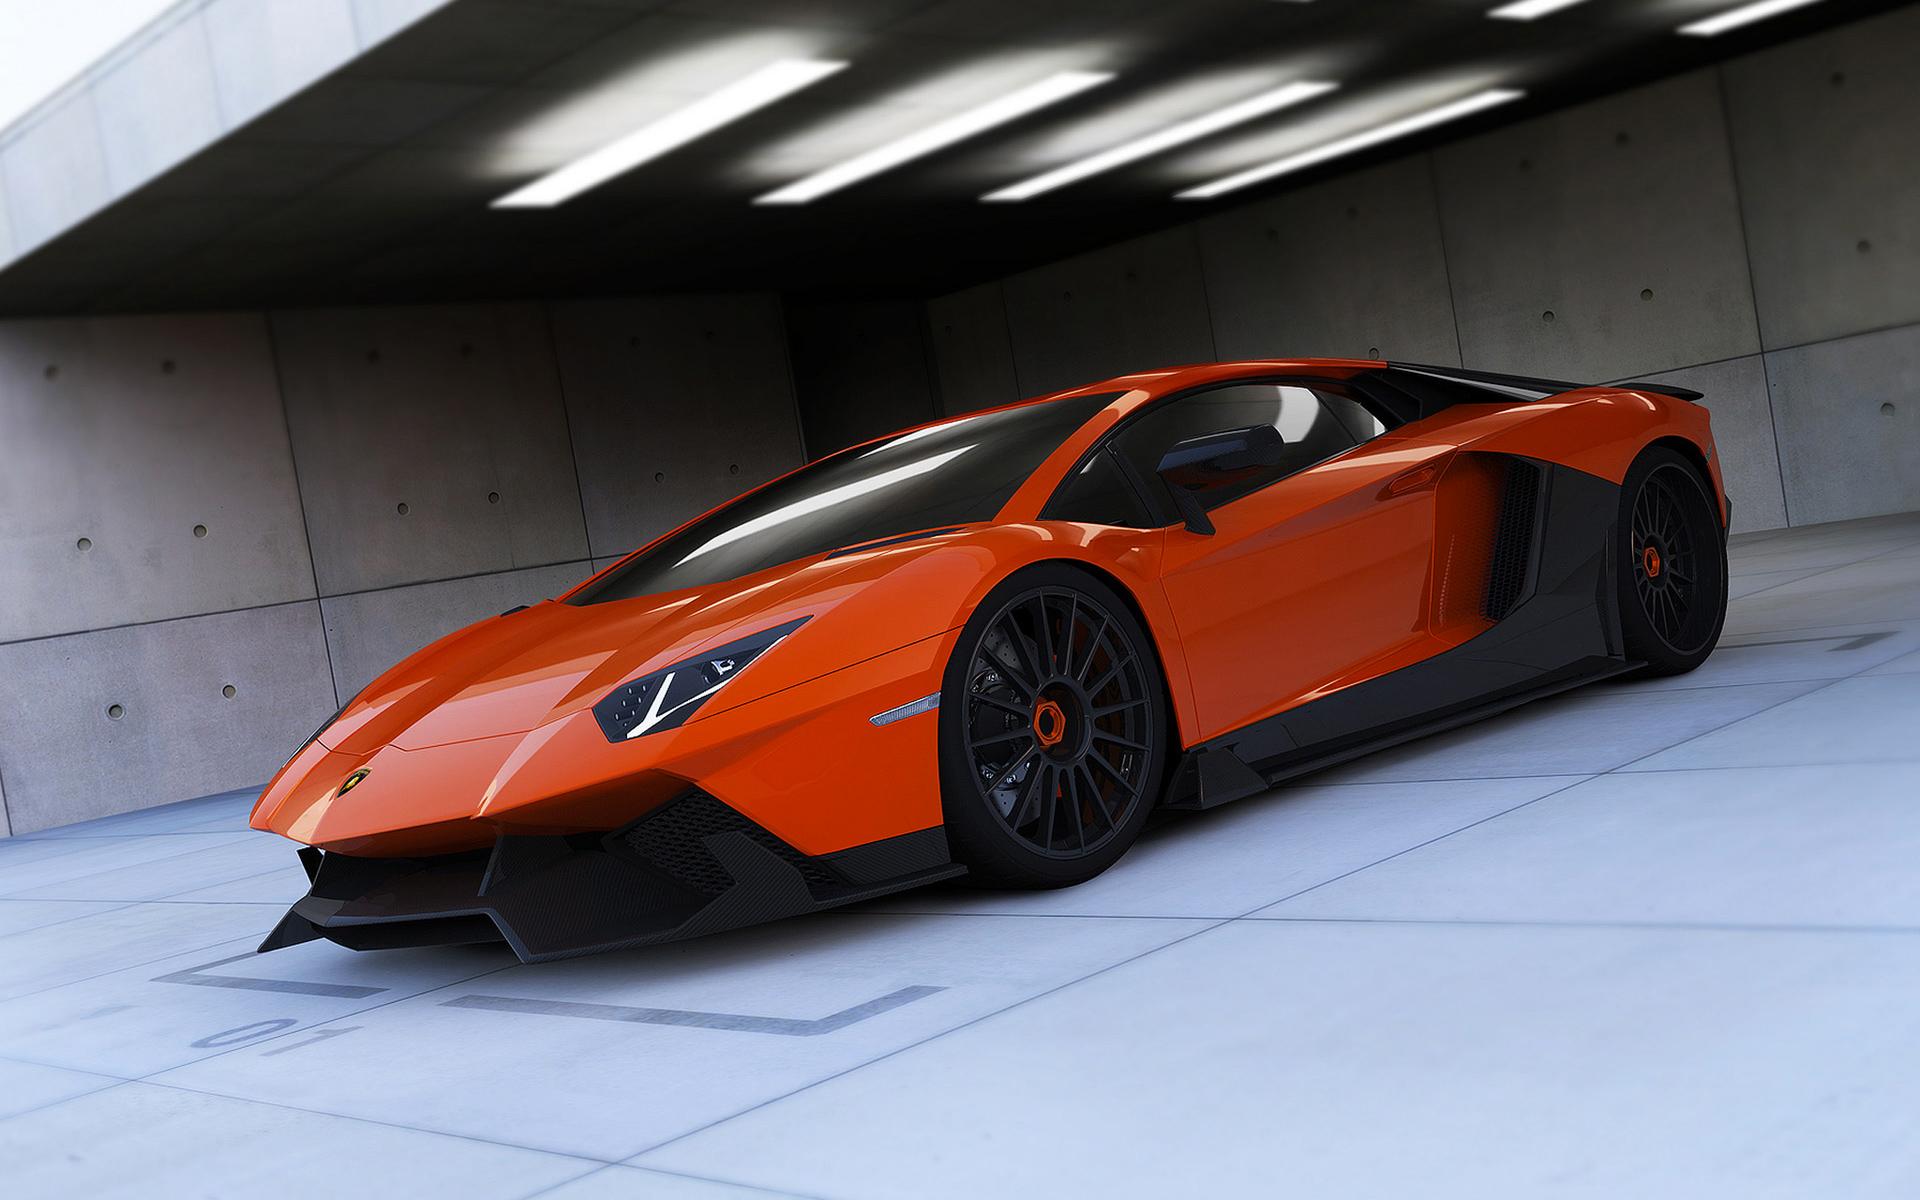 2012 RENM Lamborghini Aventador